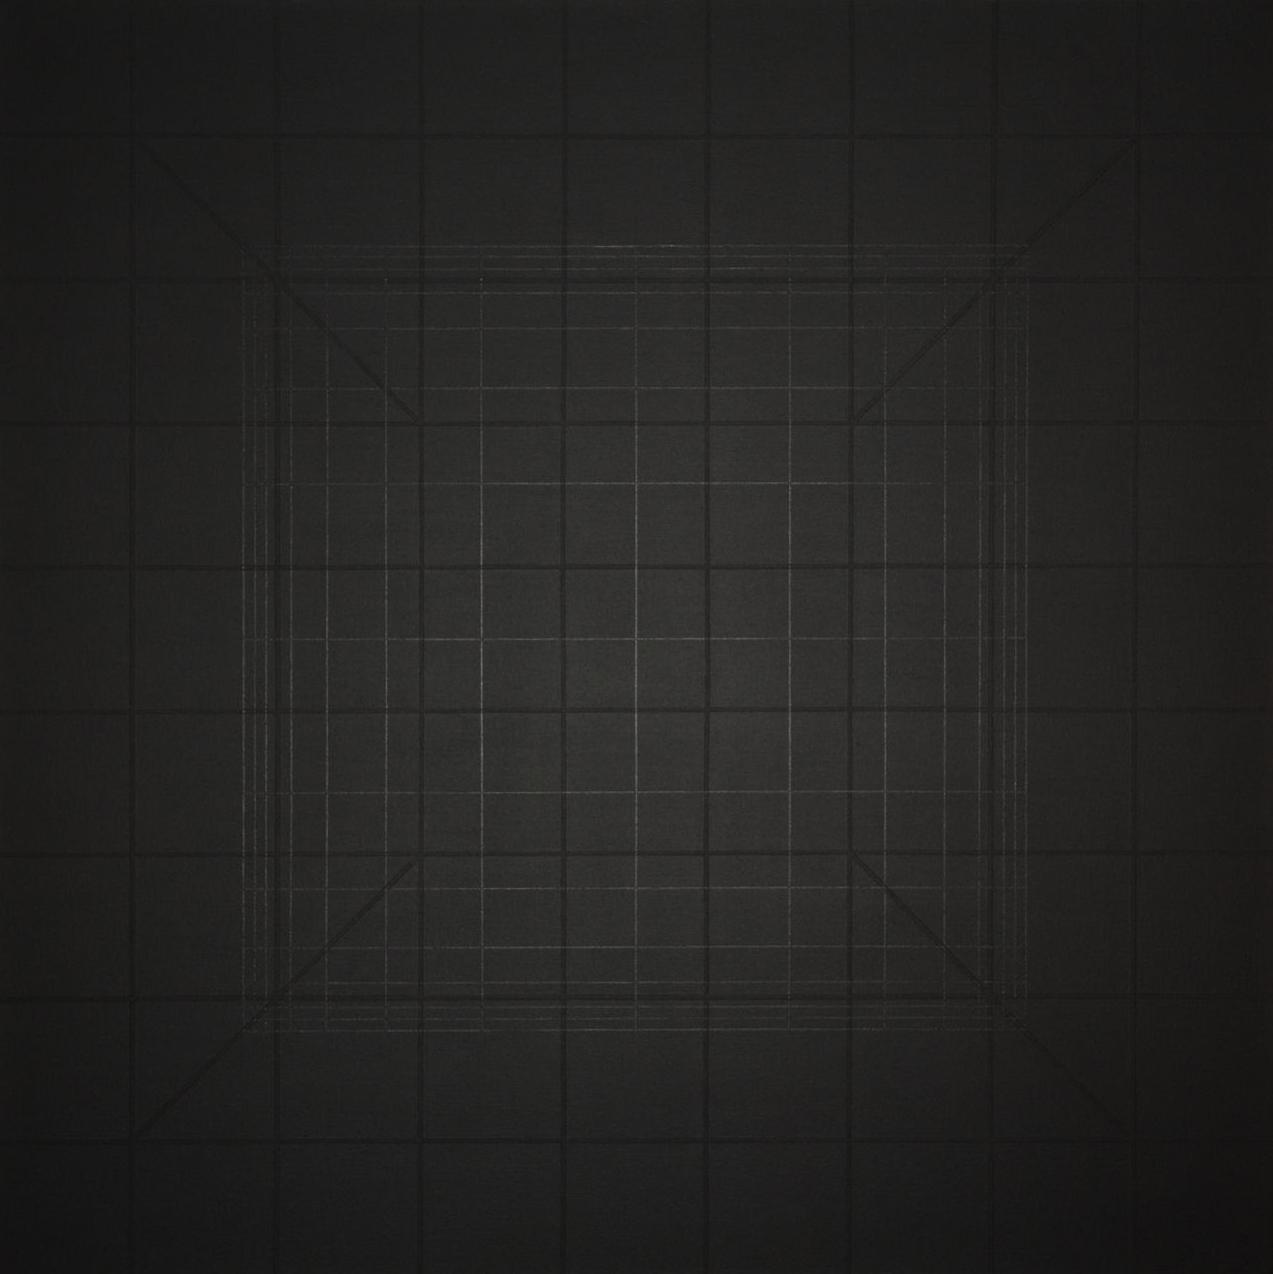 Yantra-ipsum-arkhē(2)2011.Feb, acrylic on canvas, 35 7/16 x 35 7/16 in. [90x90cm]-2